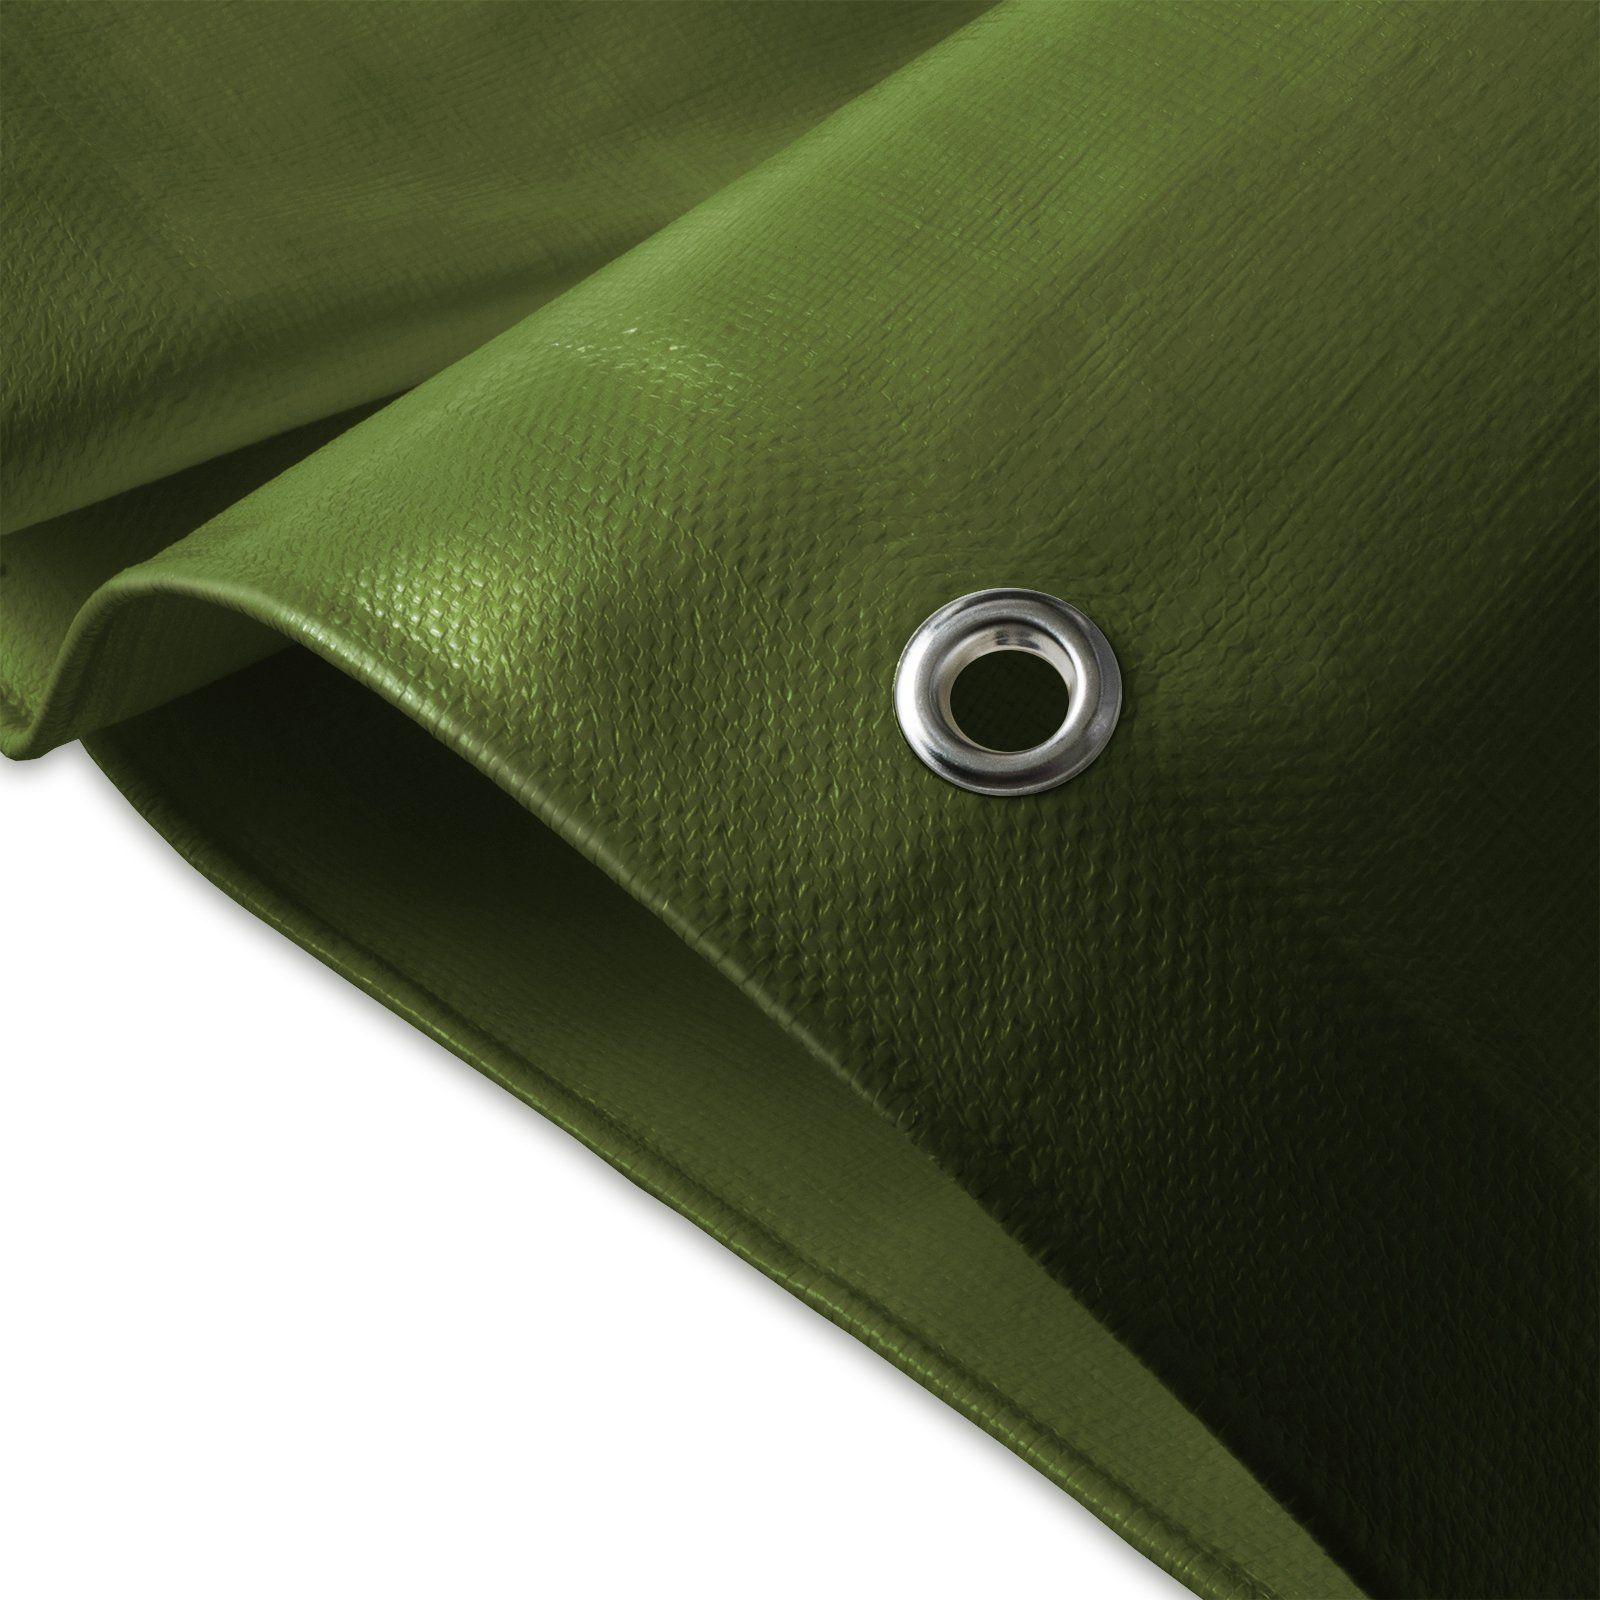 Tarps Medium Duty Waterproof Ground Tent Trailer Cover Large Tarpaulin In Multiple Sizes 6 Oz Sq Yd Green 20 X 30 Tarpaulin Waterproof Tarp Canvas Tarps